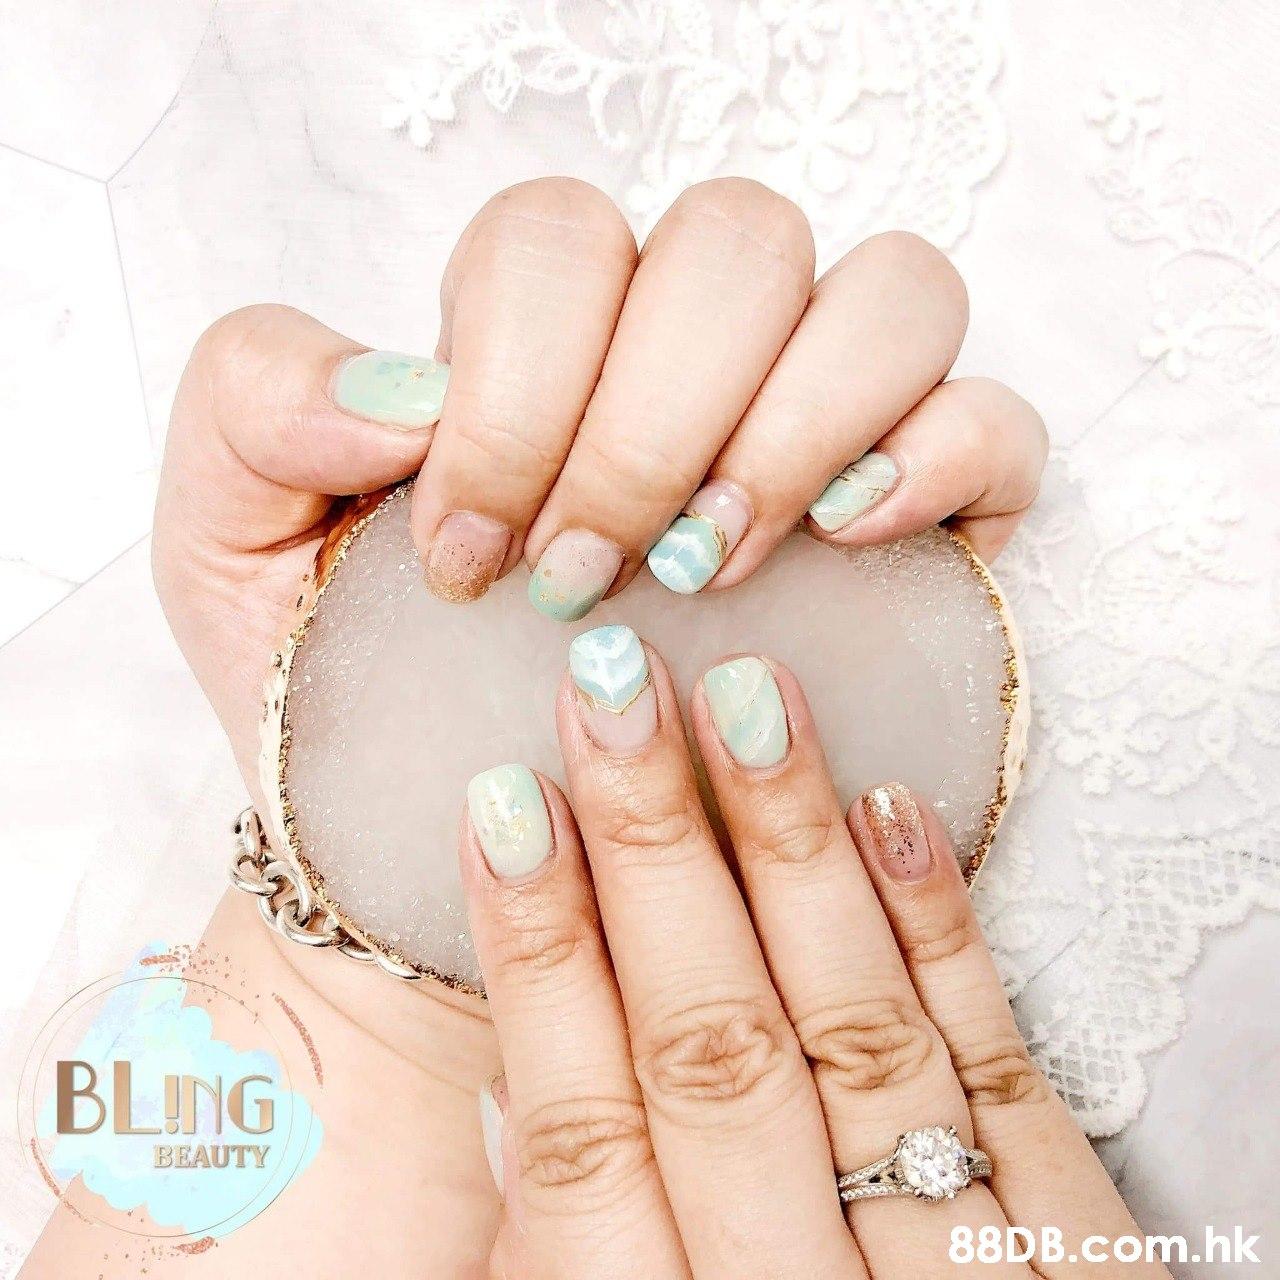 BLING BEAUTY .hk  Nail,Manicure,Nail care,Finger,Skin